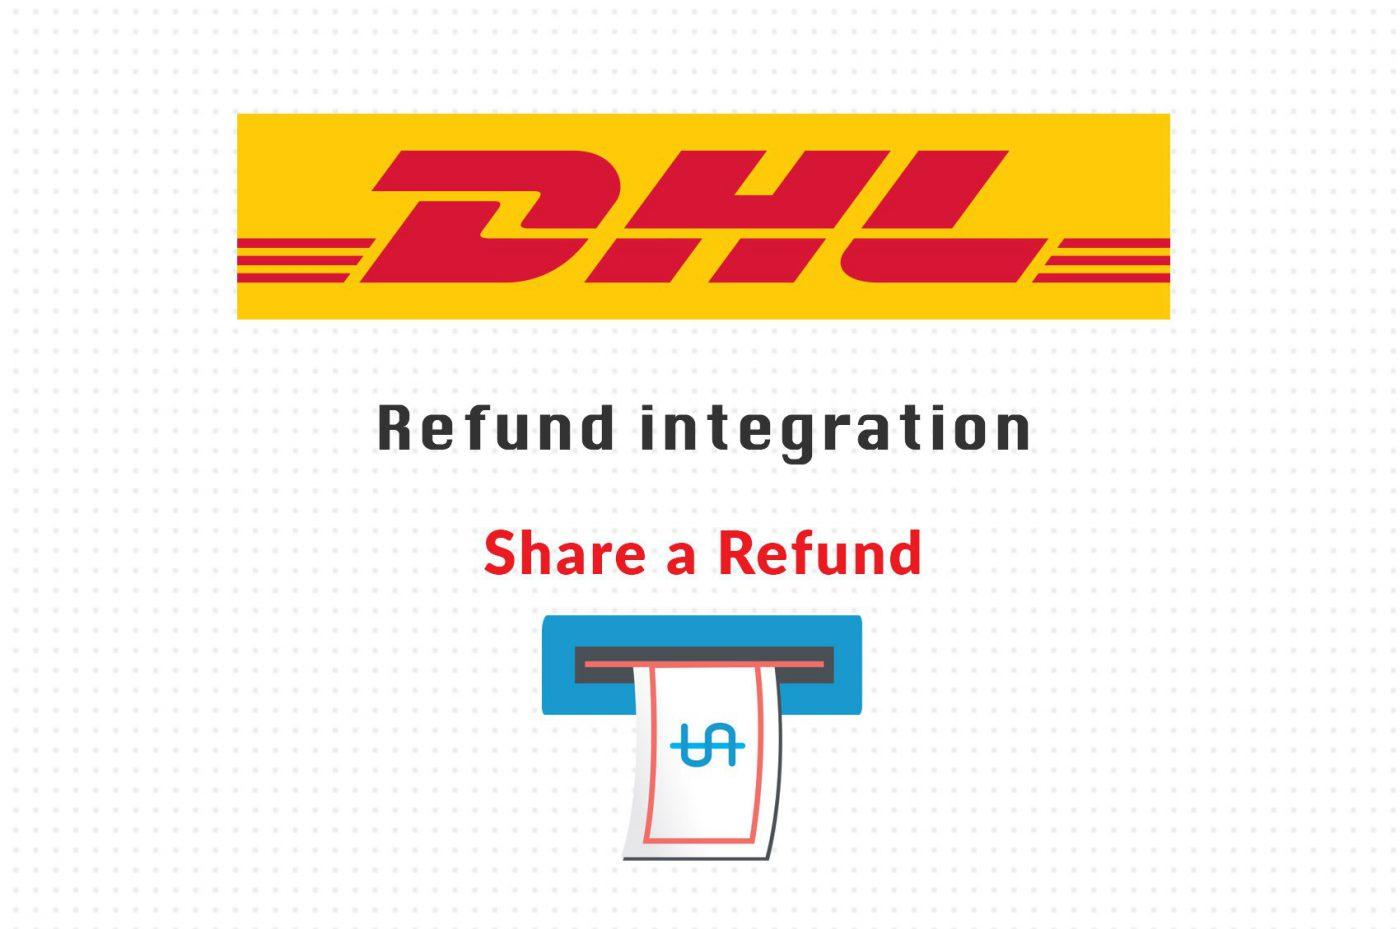 DHL Express refund integration